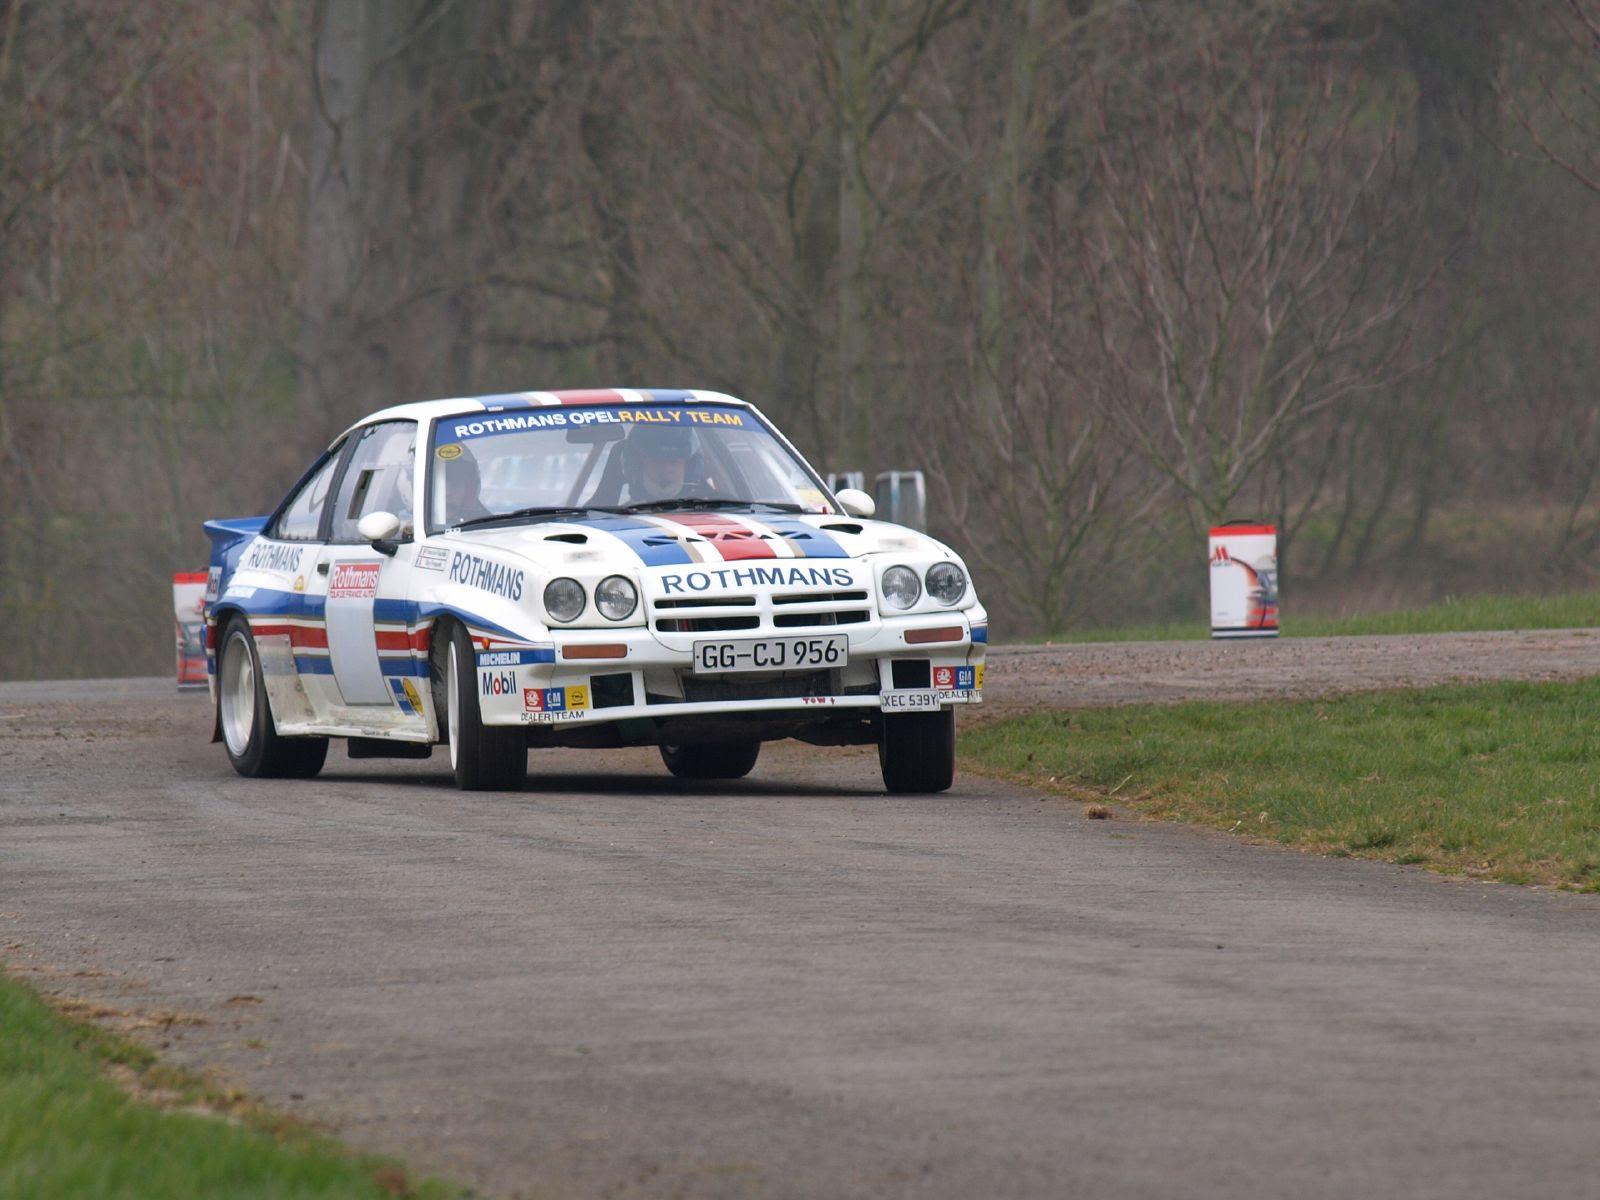 http://upload.wikimedia.org/wikipedia/commons/b/bb/Opel_Manta_400_-_Race_Retro_2008_02.jpg